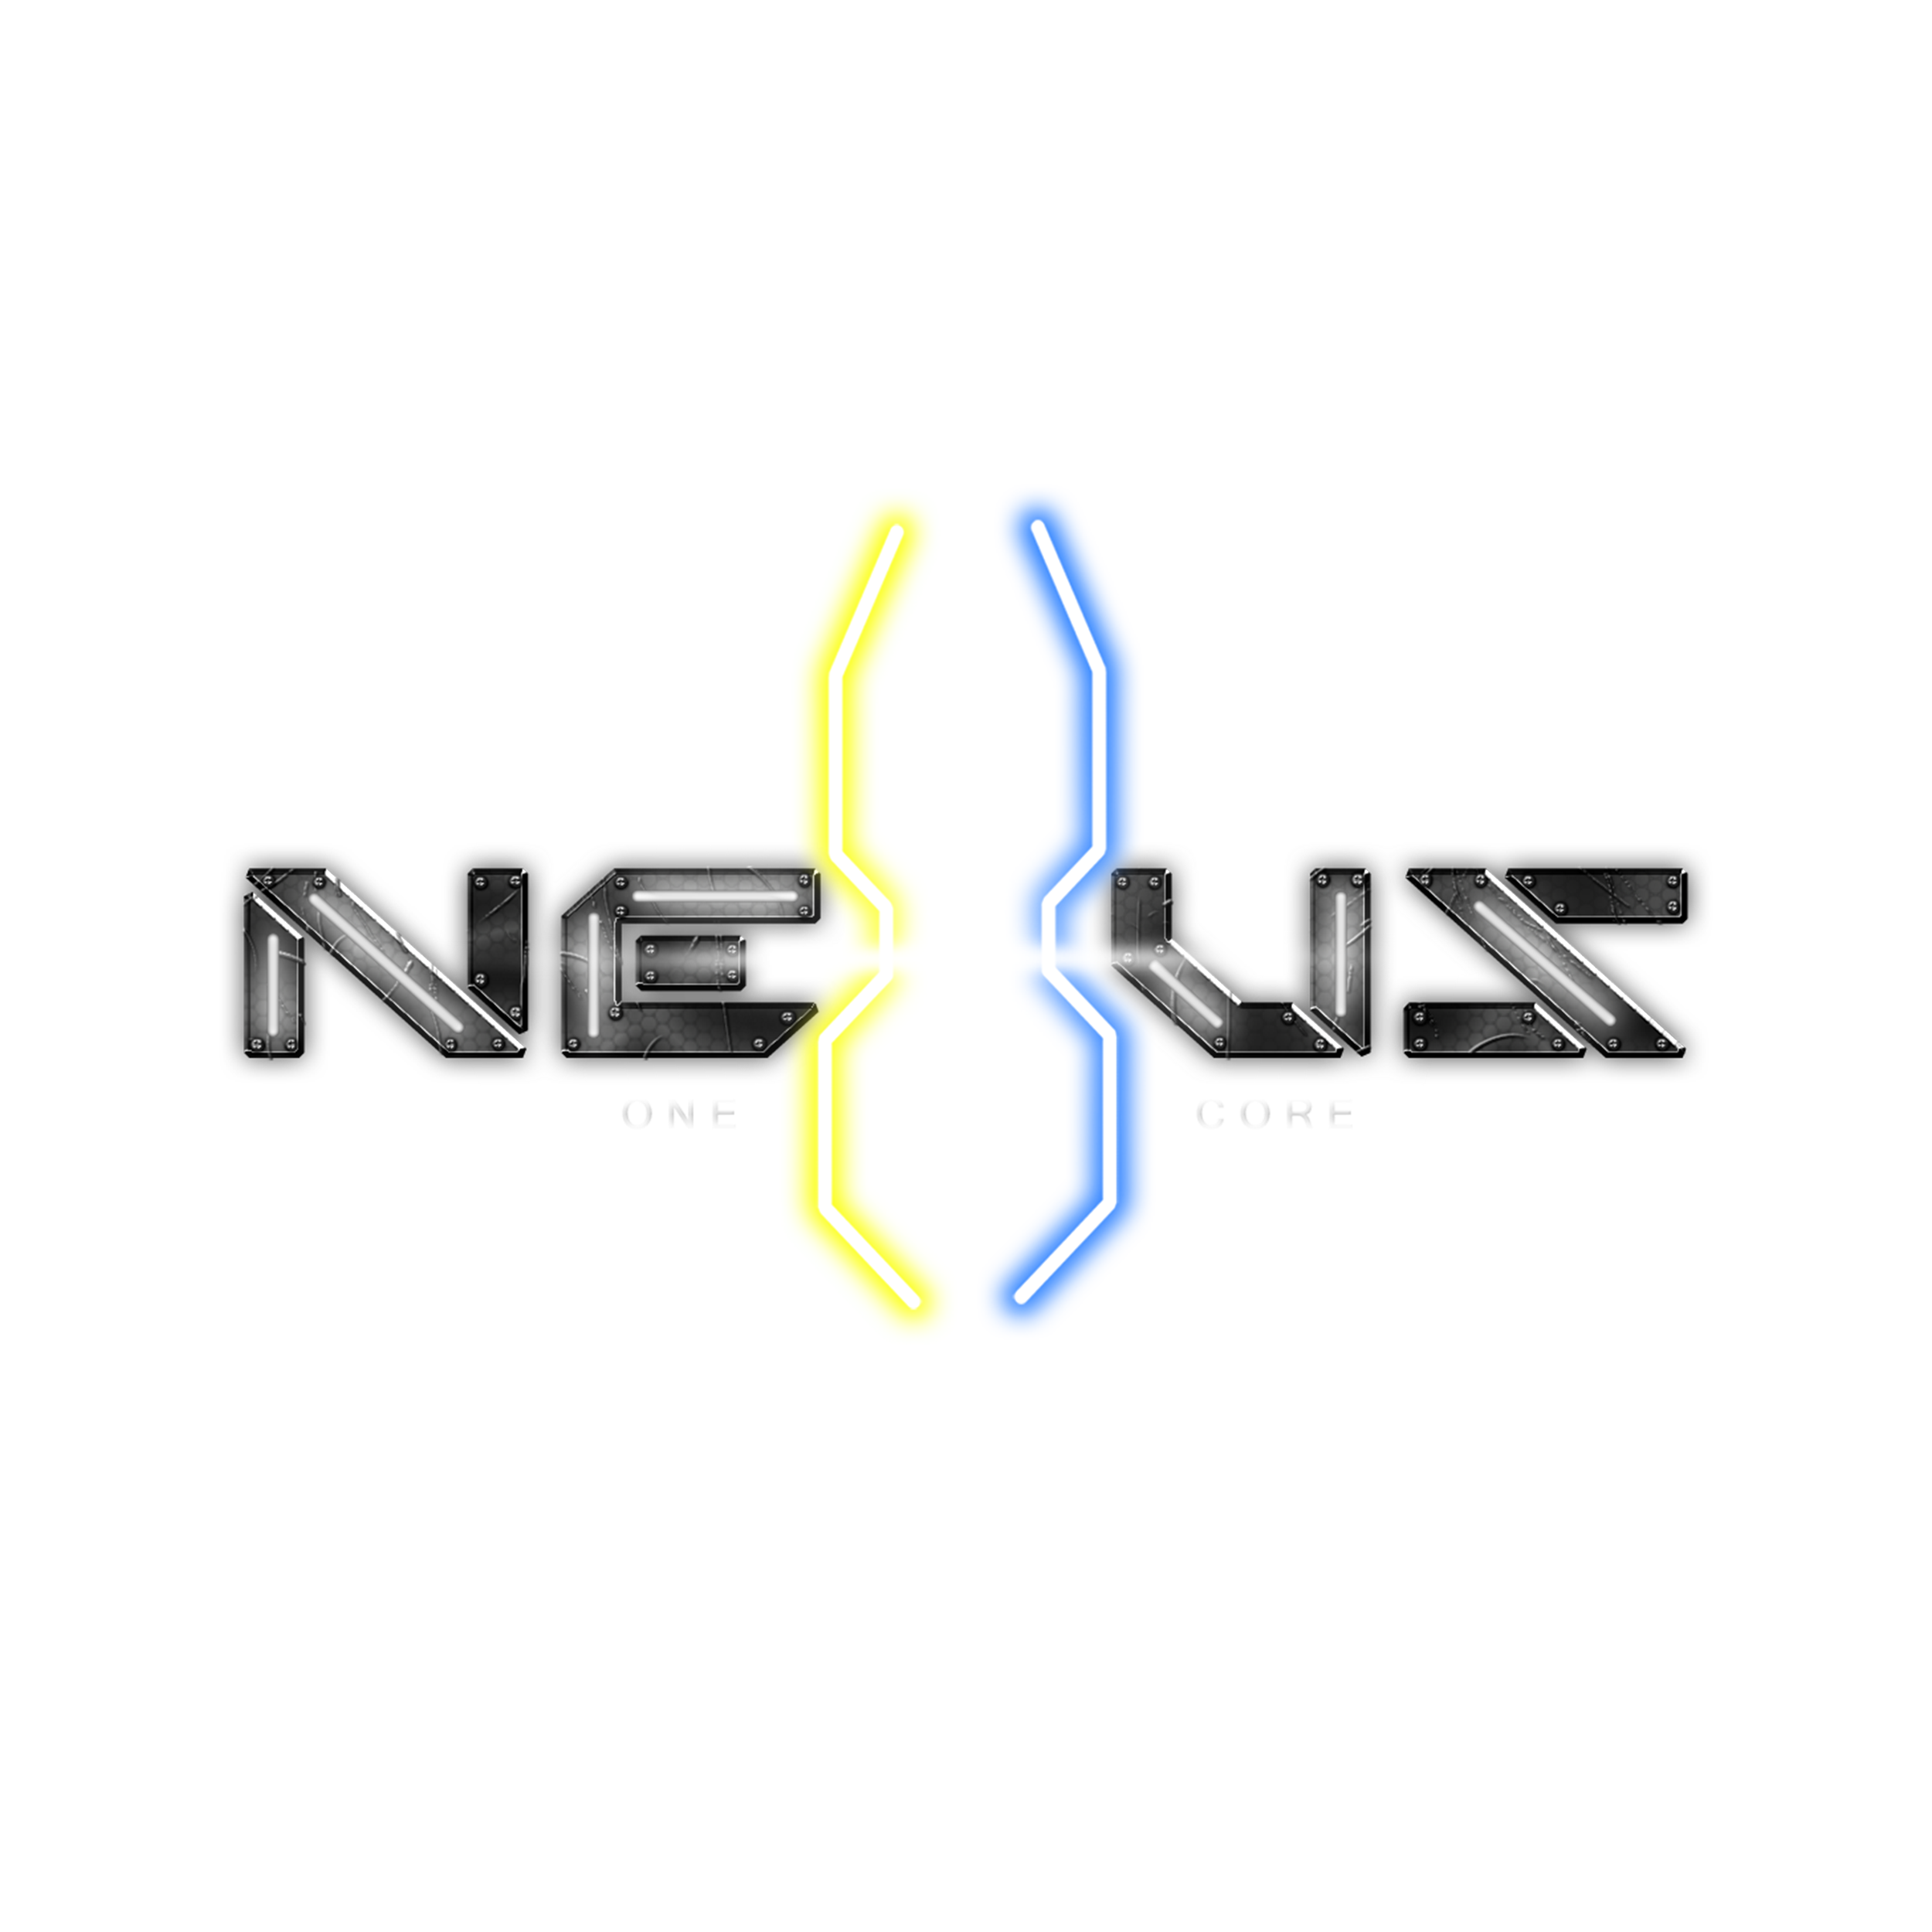 Nexus: One Core logo